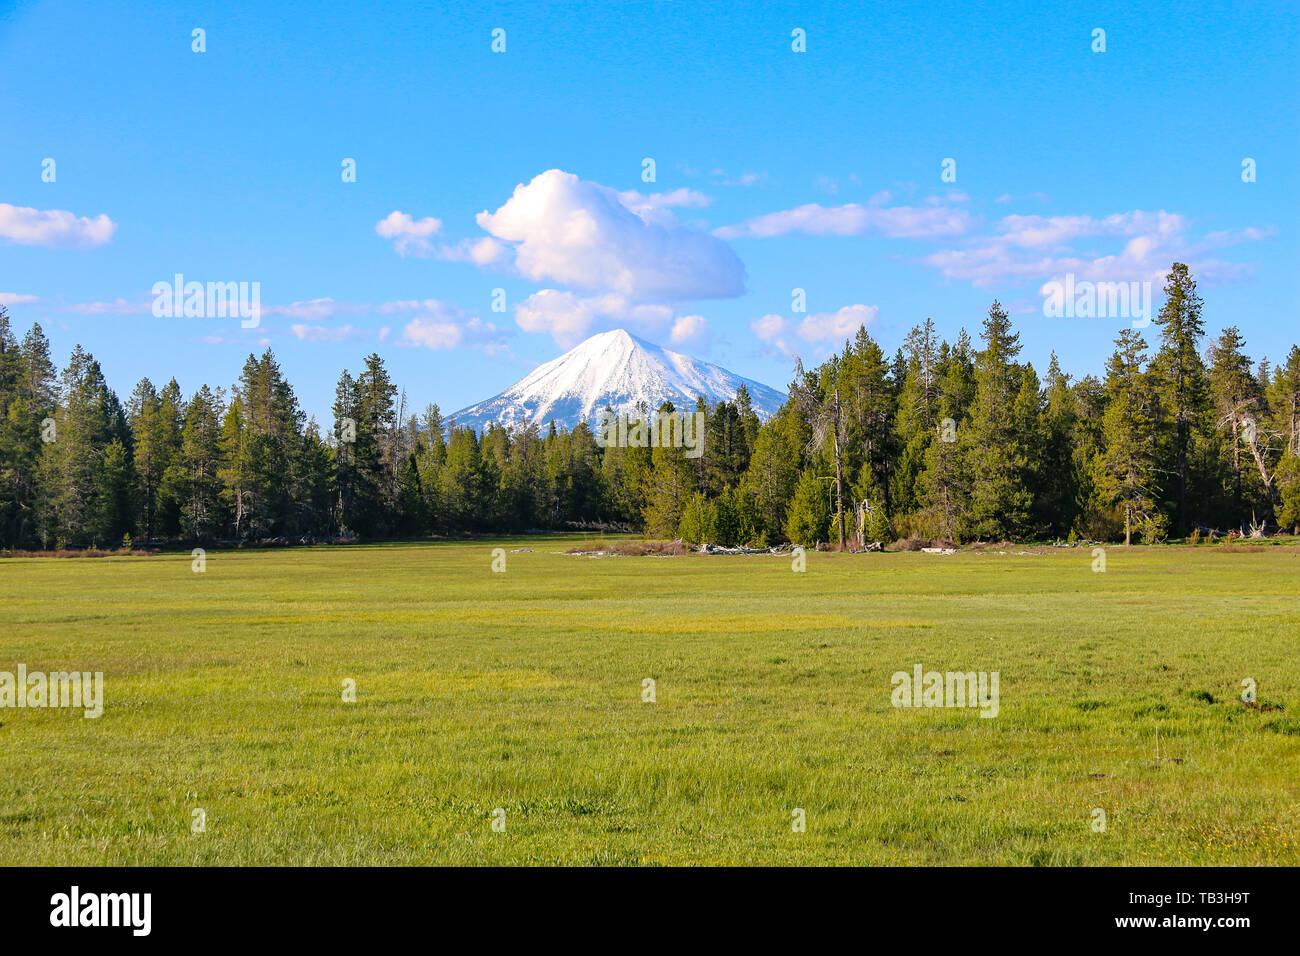 Mount McLoughlin, Oregon, USA - Stock Image